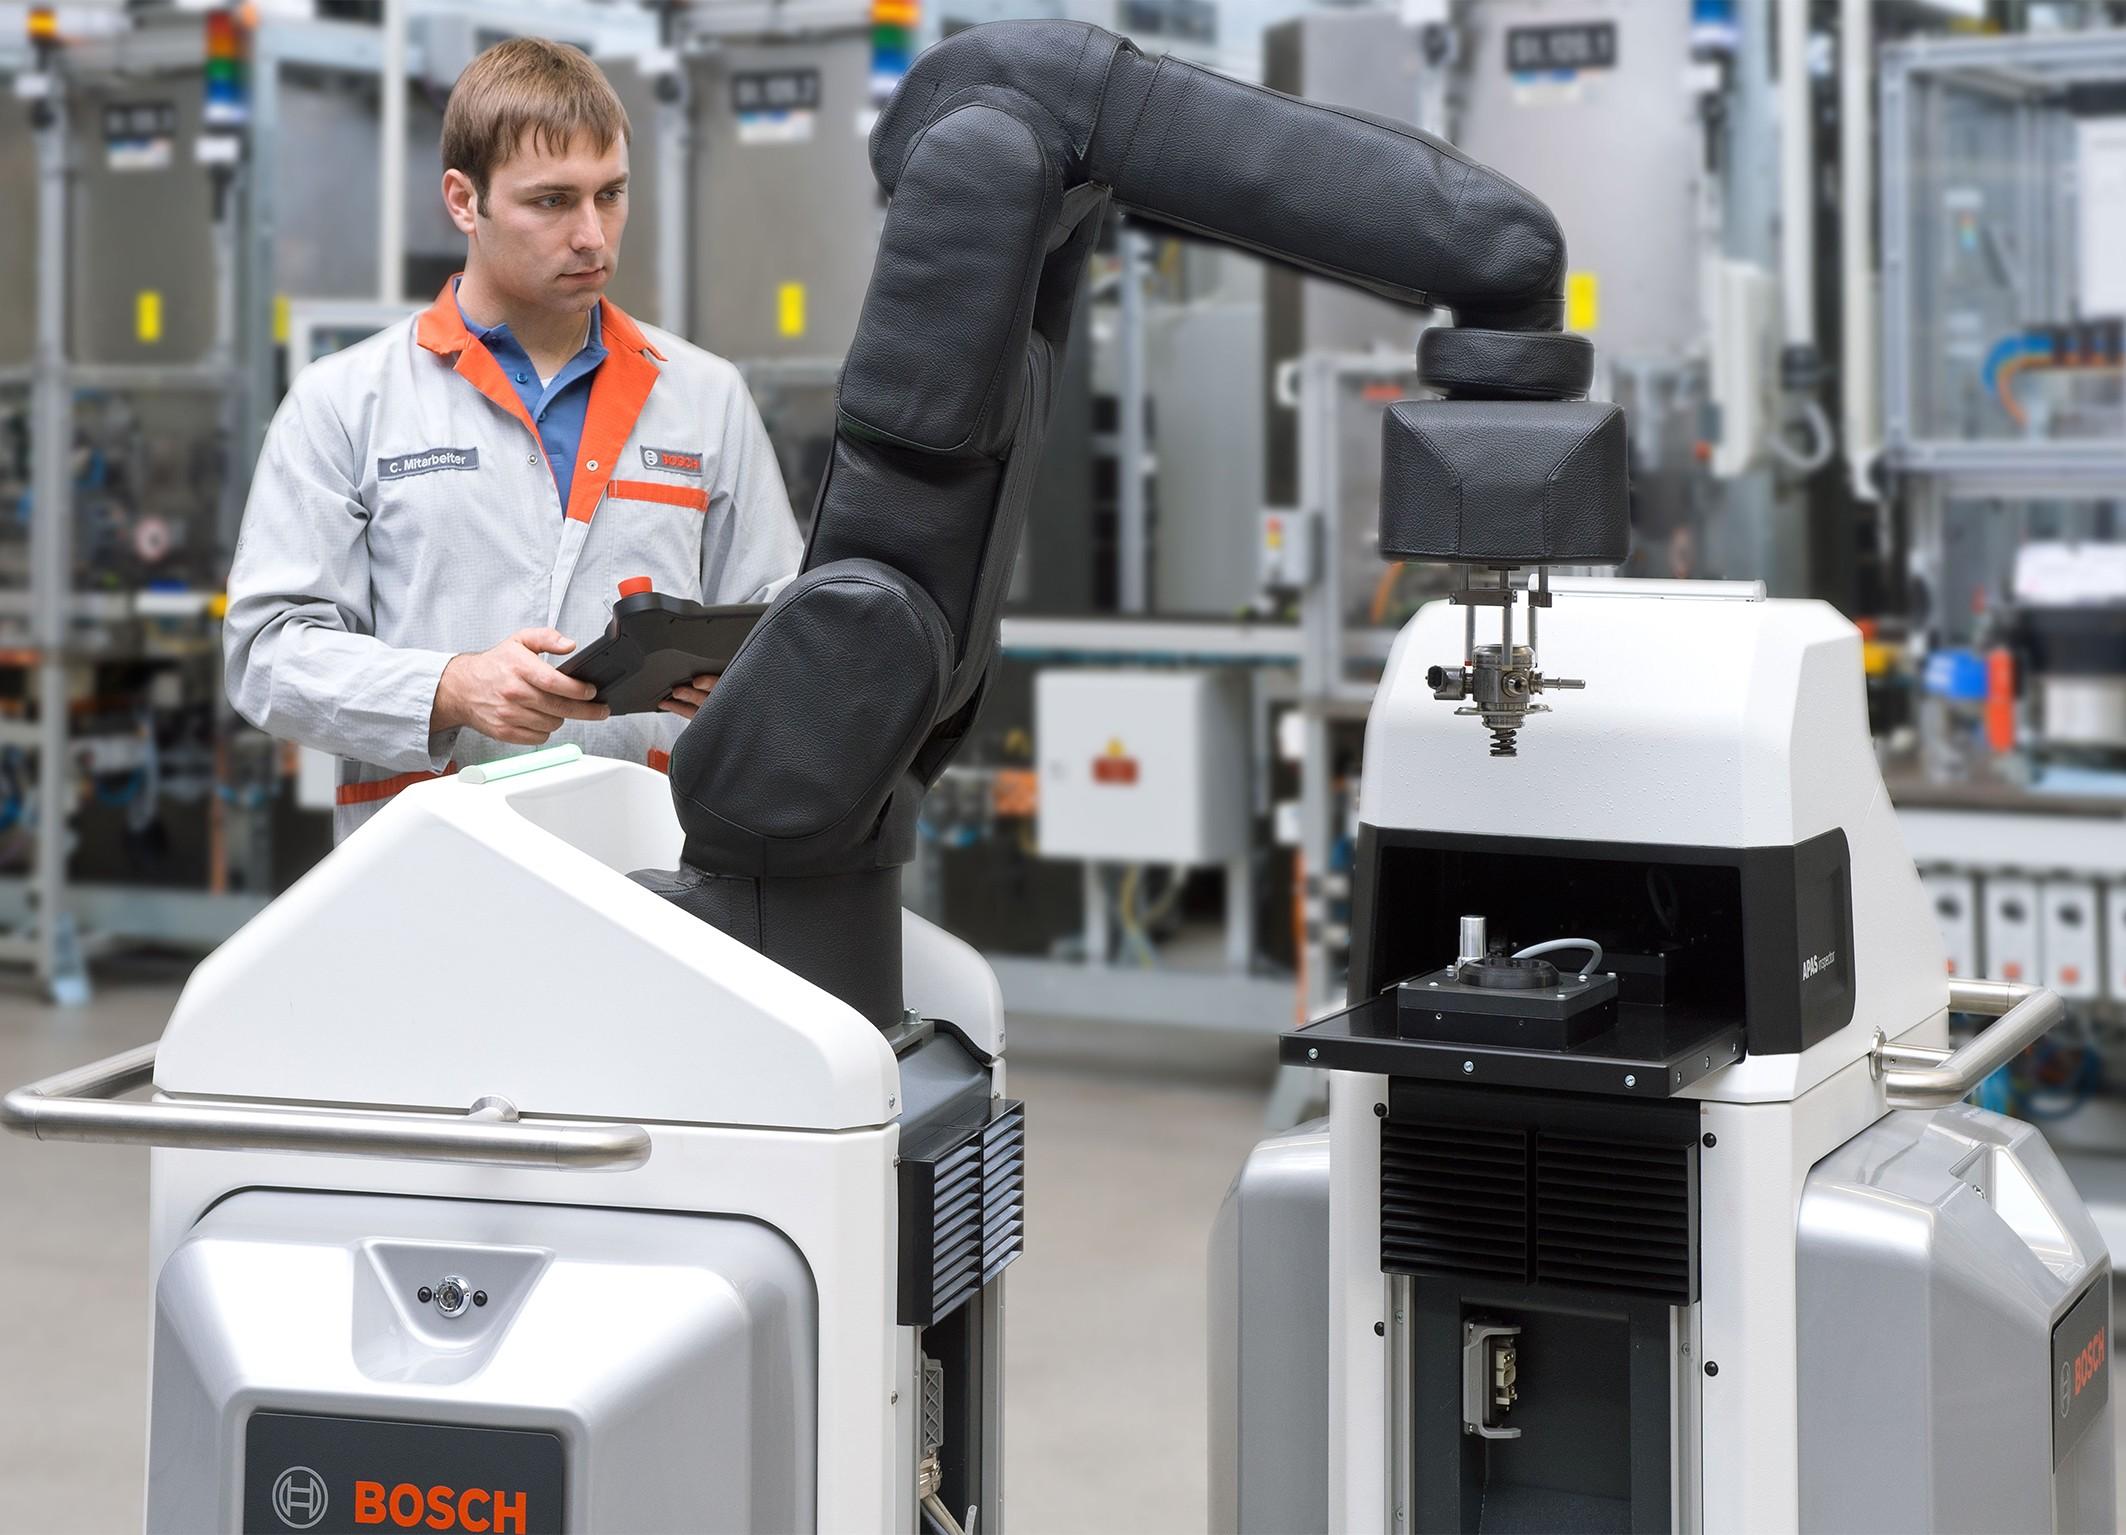 BOSCH collaborative robot